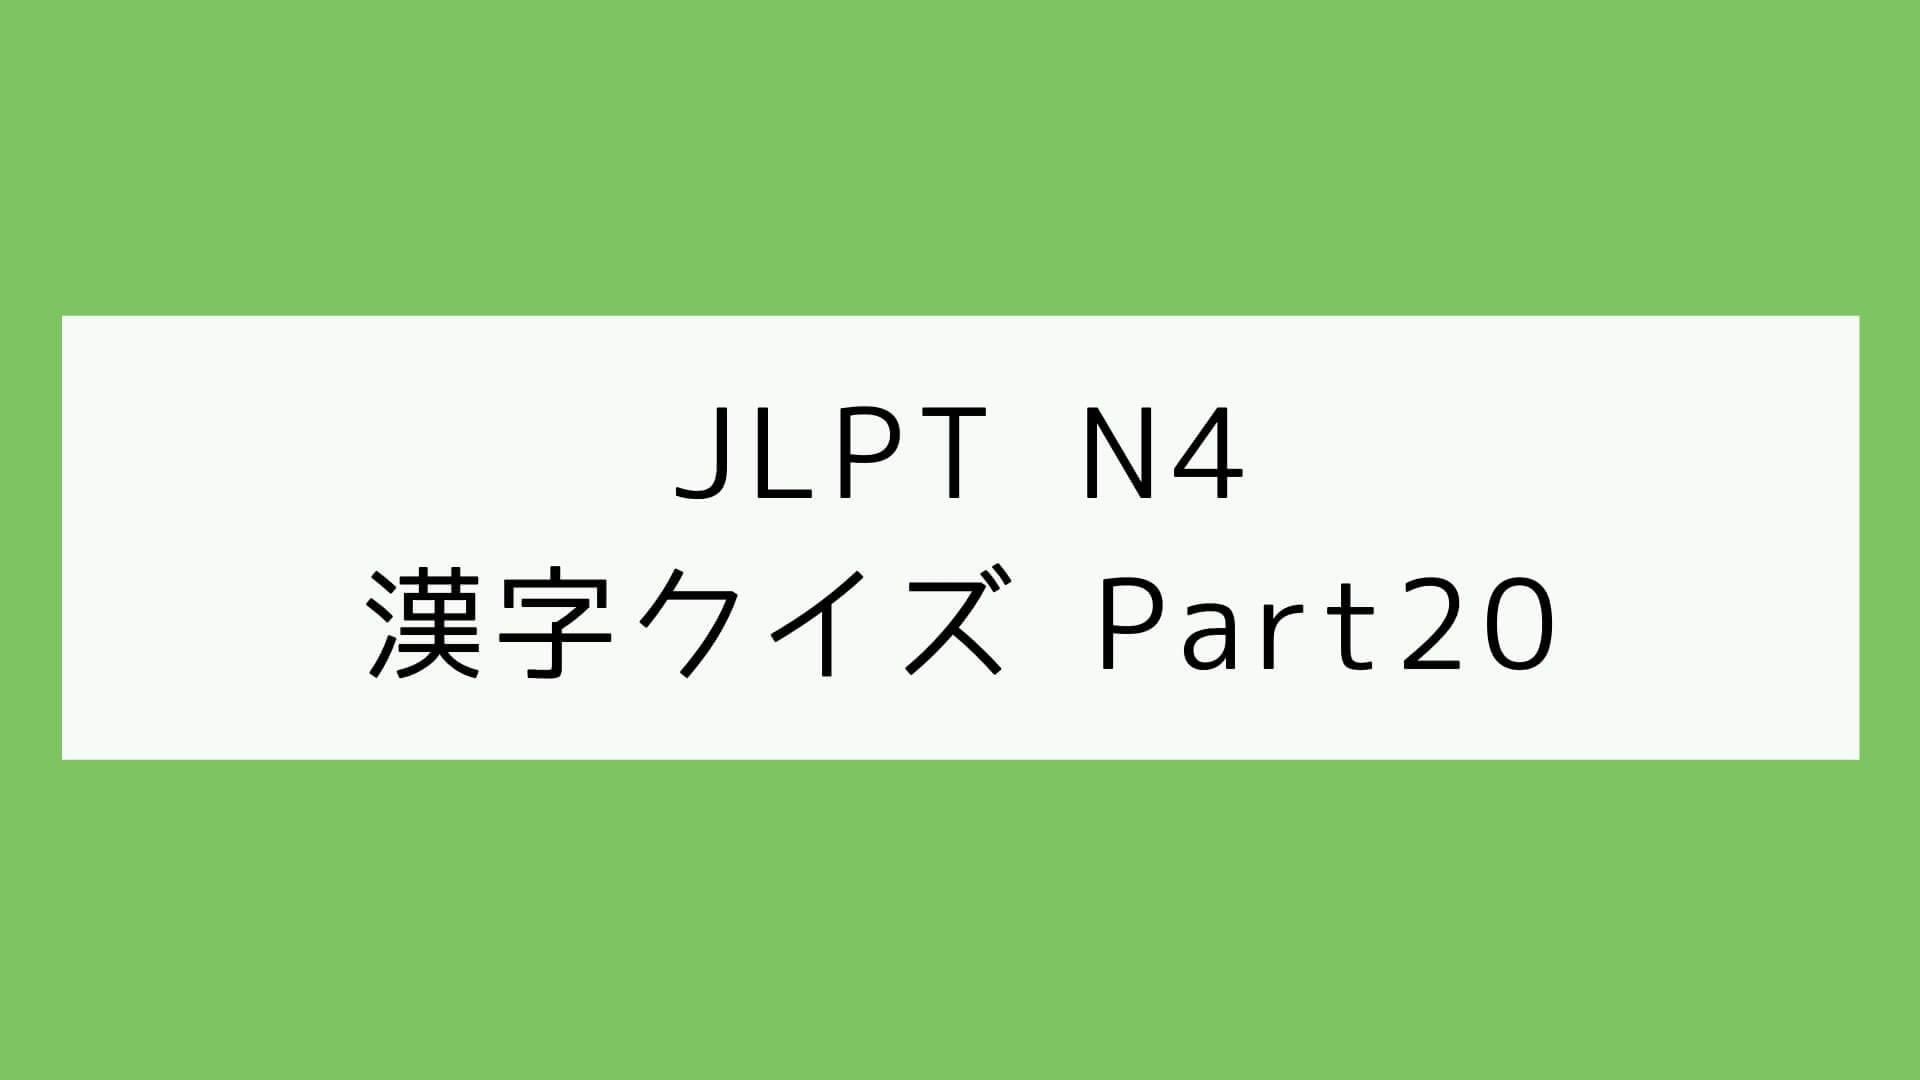 【JLPT N4】漢字クイズ Part20